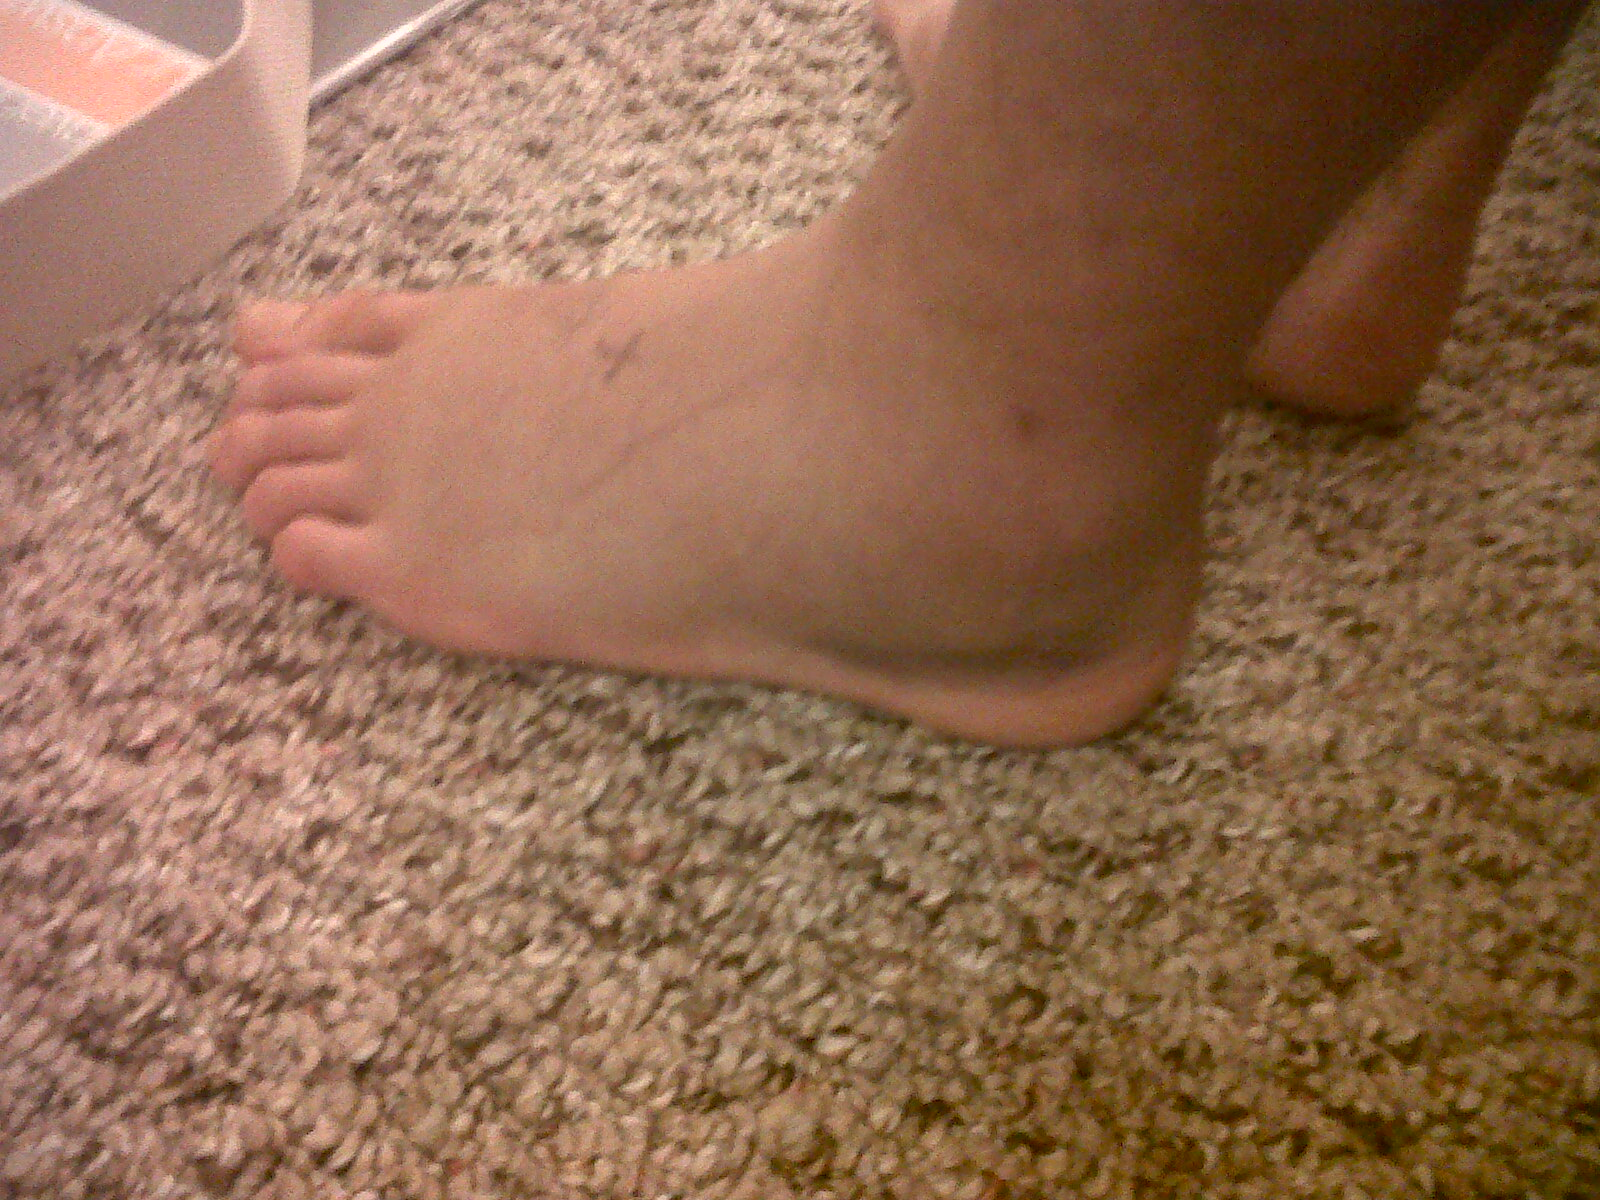 After A Tibial Fracture D Fractured Tibia Fibula Broken Lower Leg Img